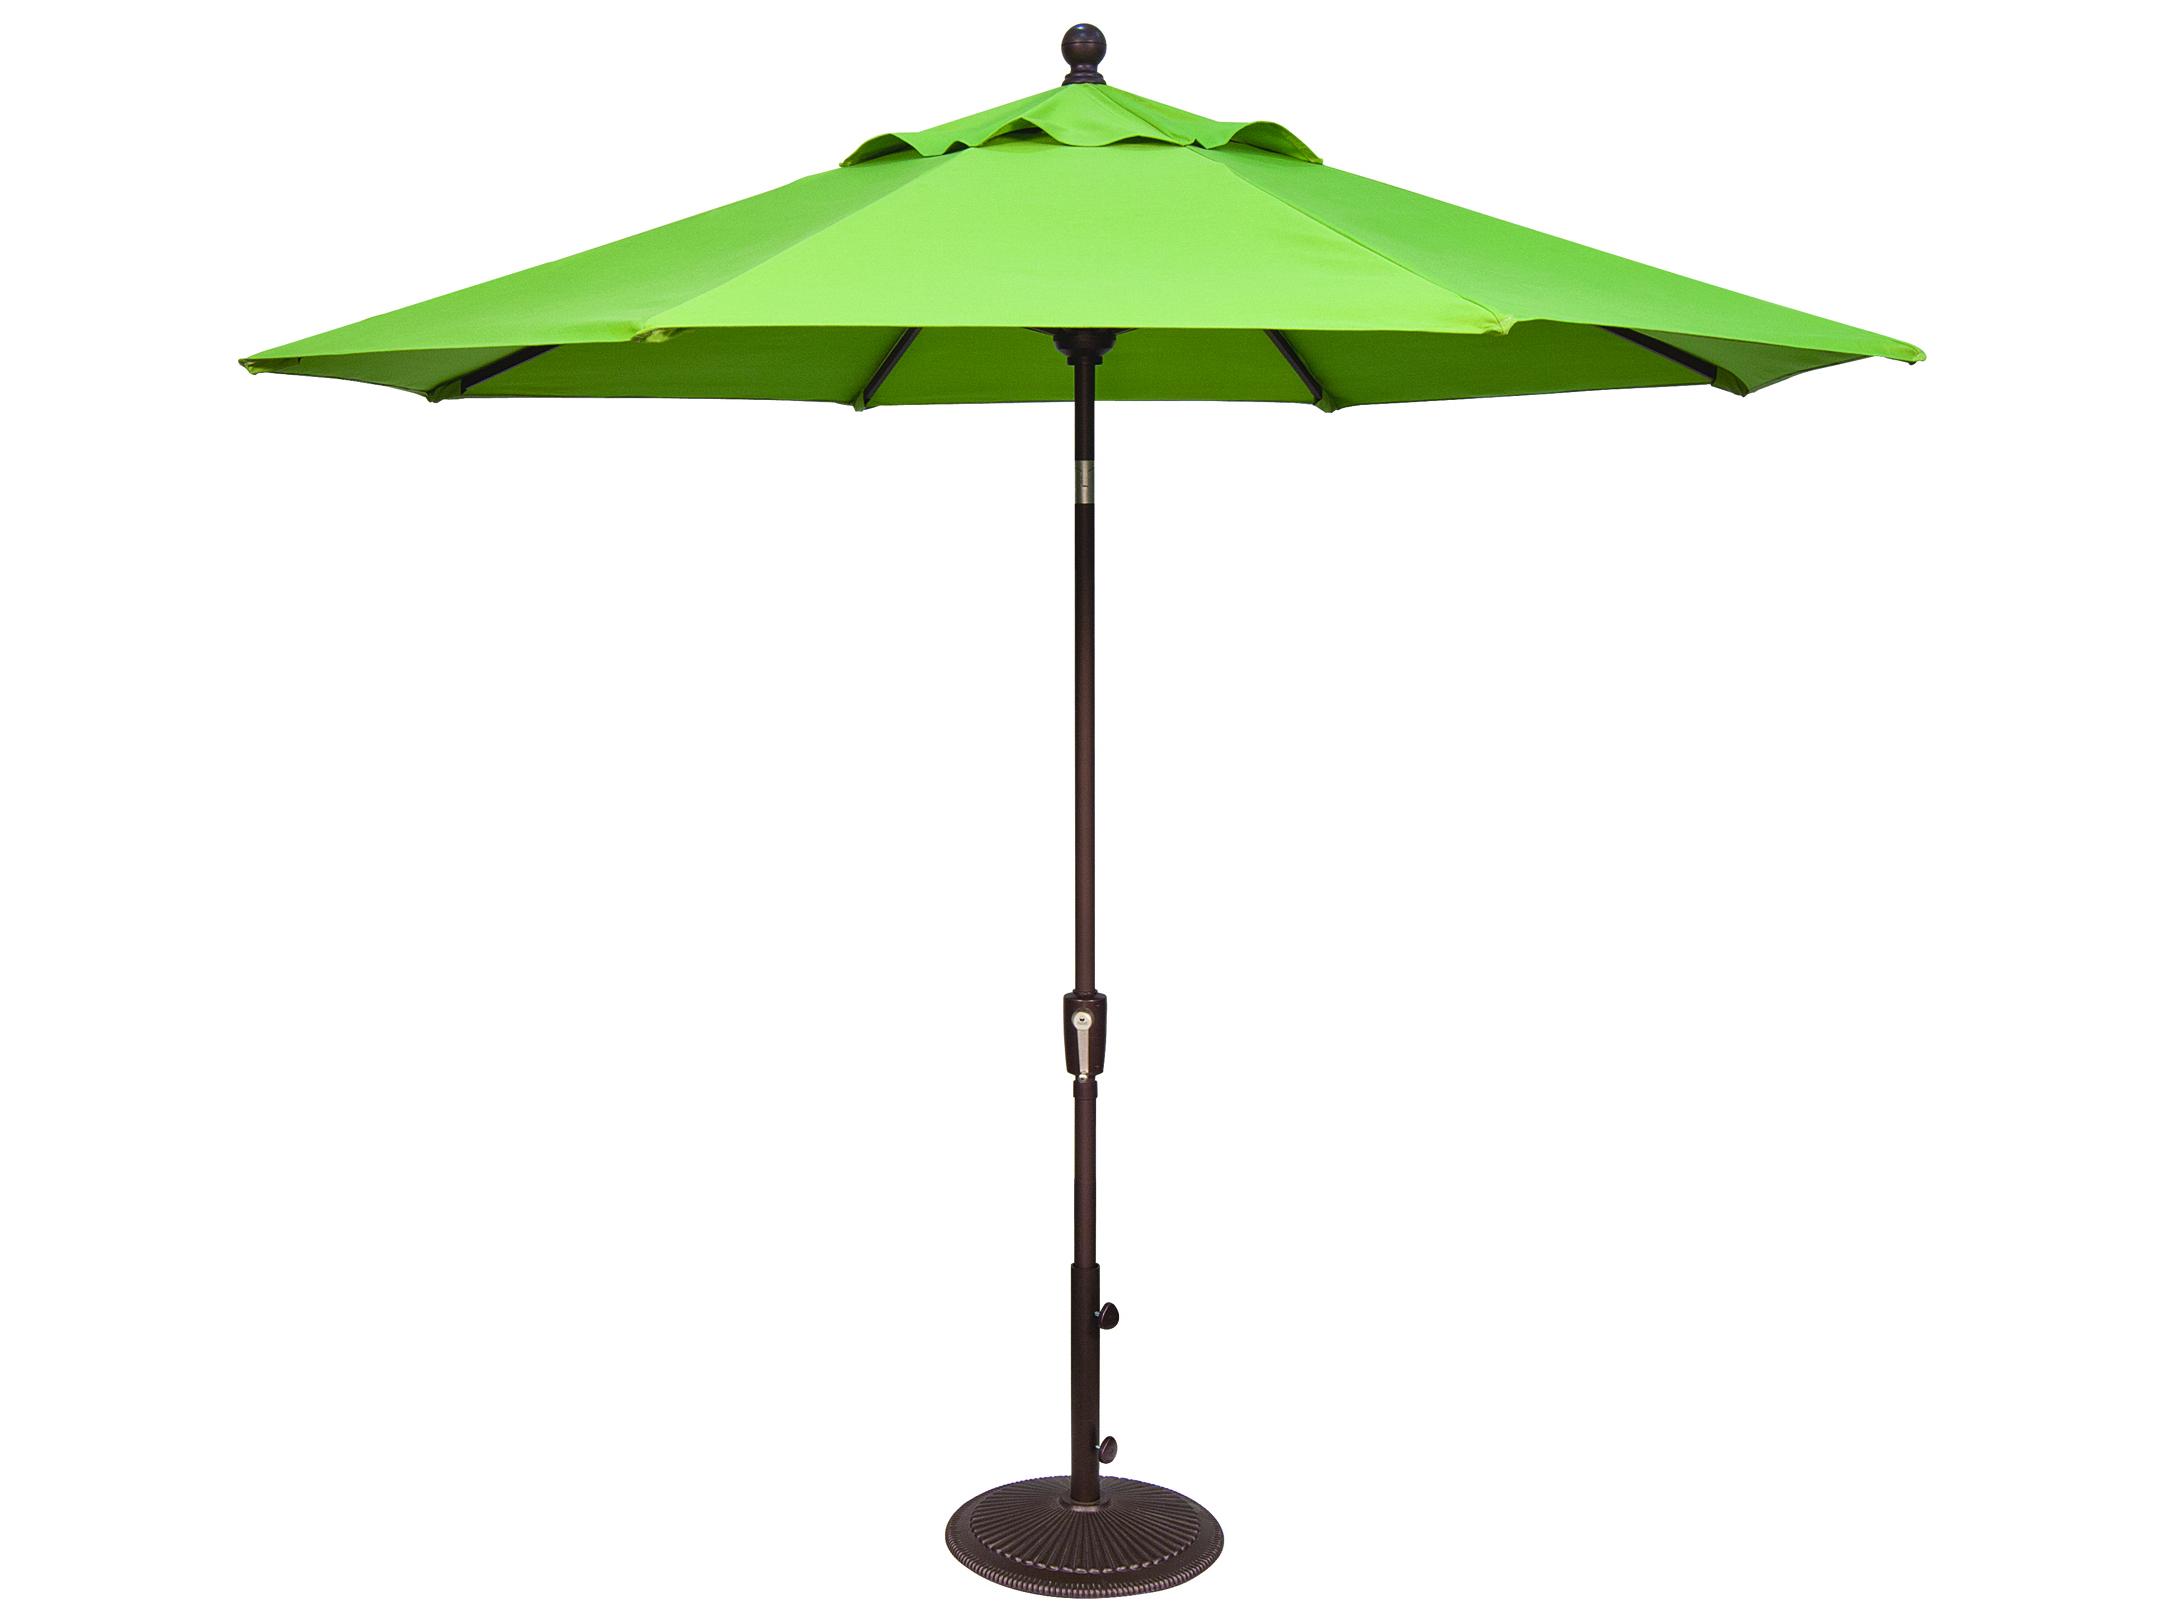 Treasure Garden Market Aluminum 9 39 Foot Wide Crank Lift Push Button Tilt Umbrella Um920